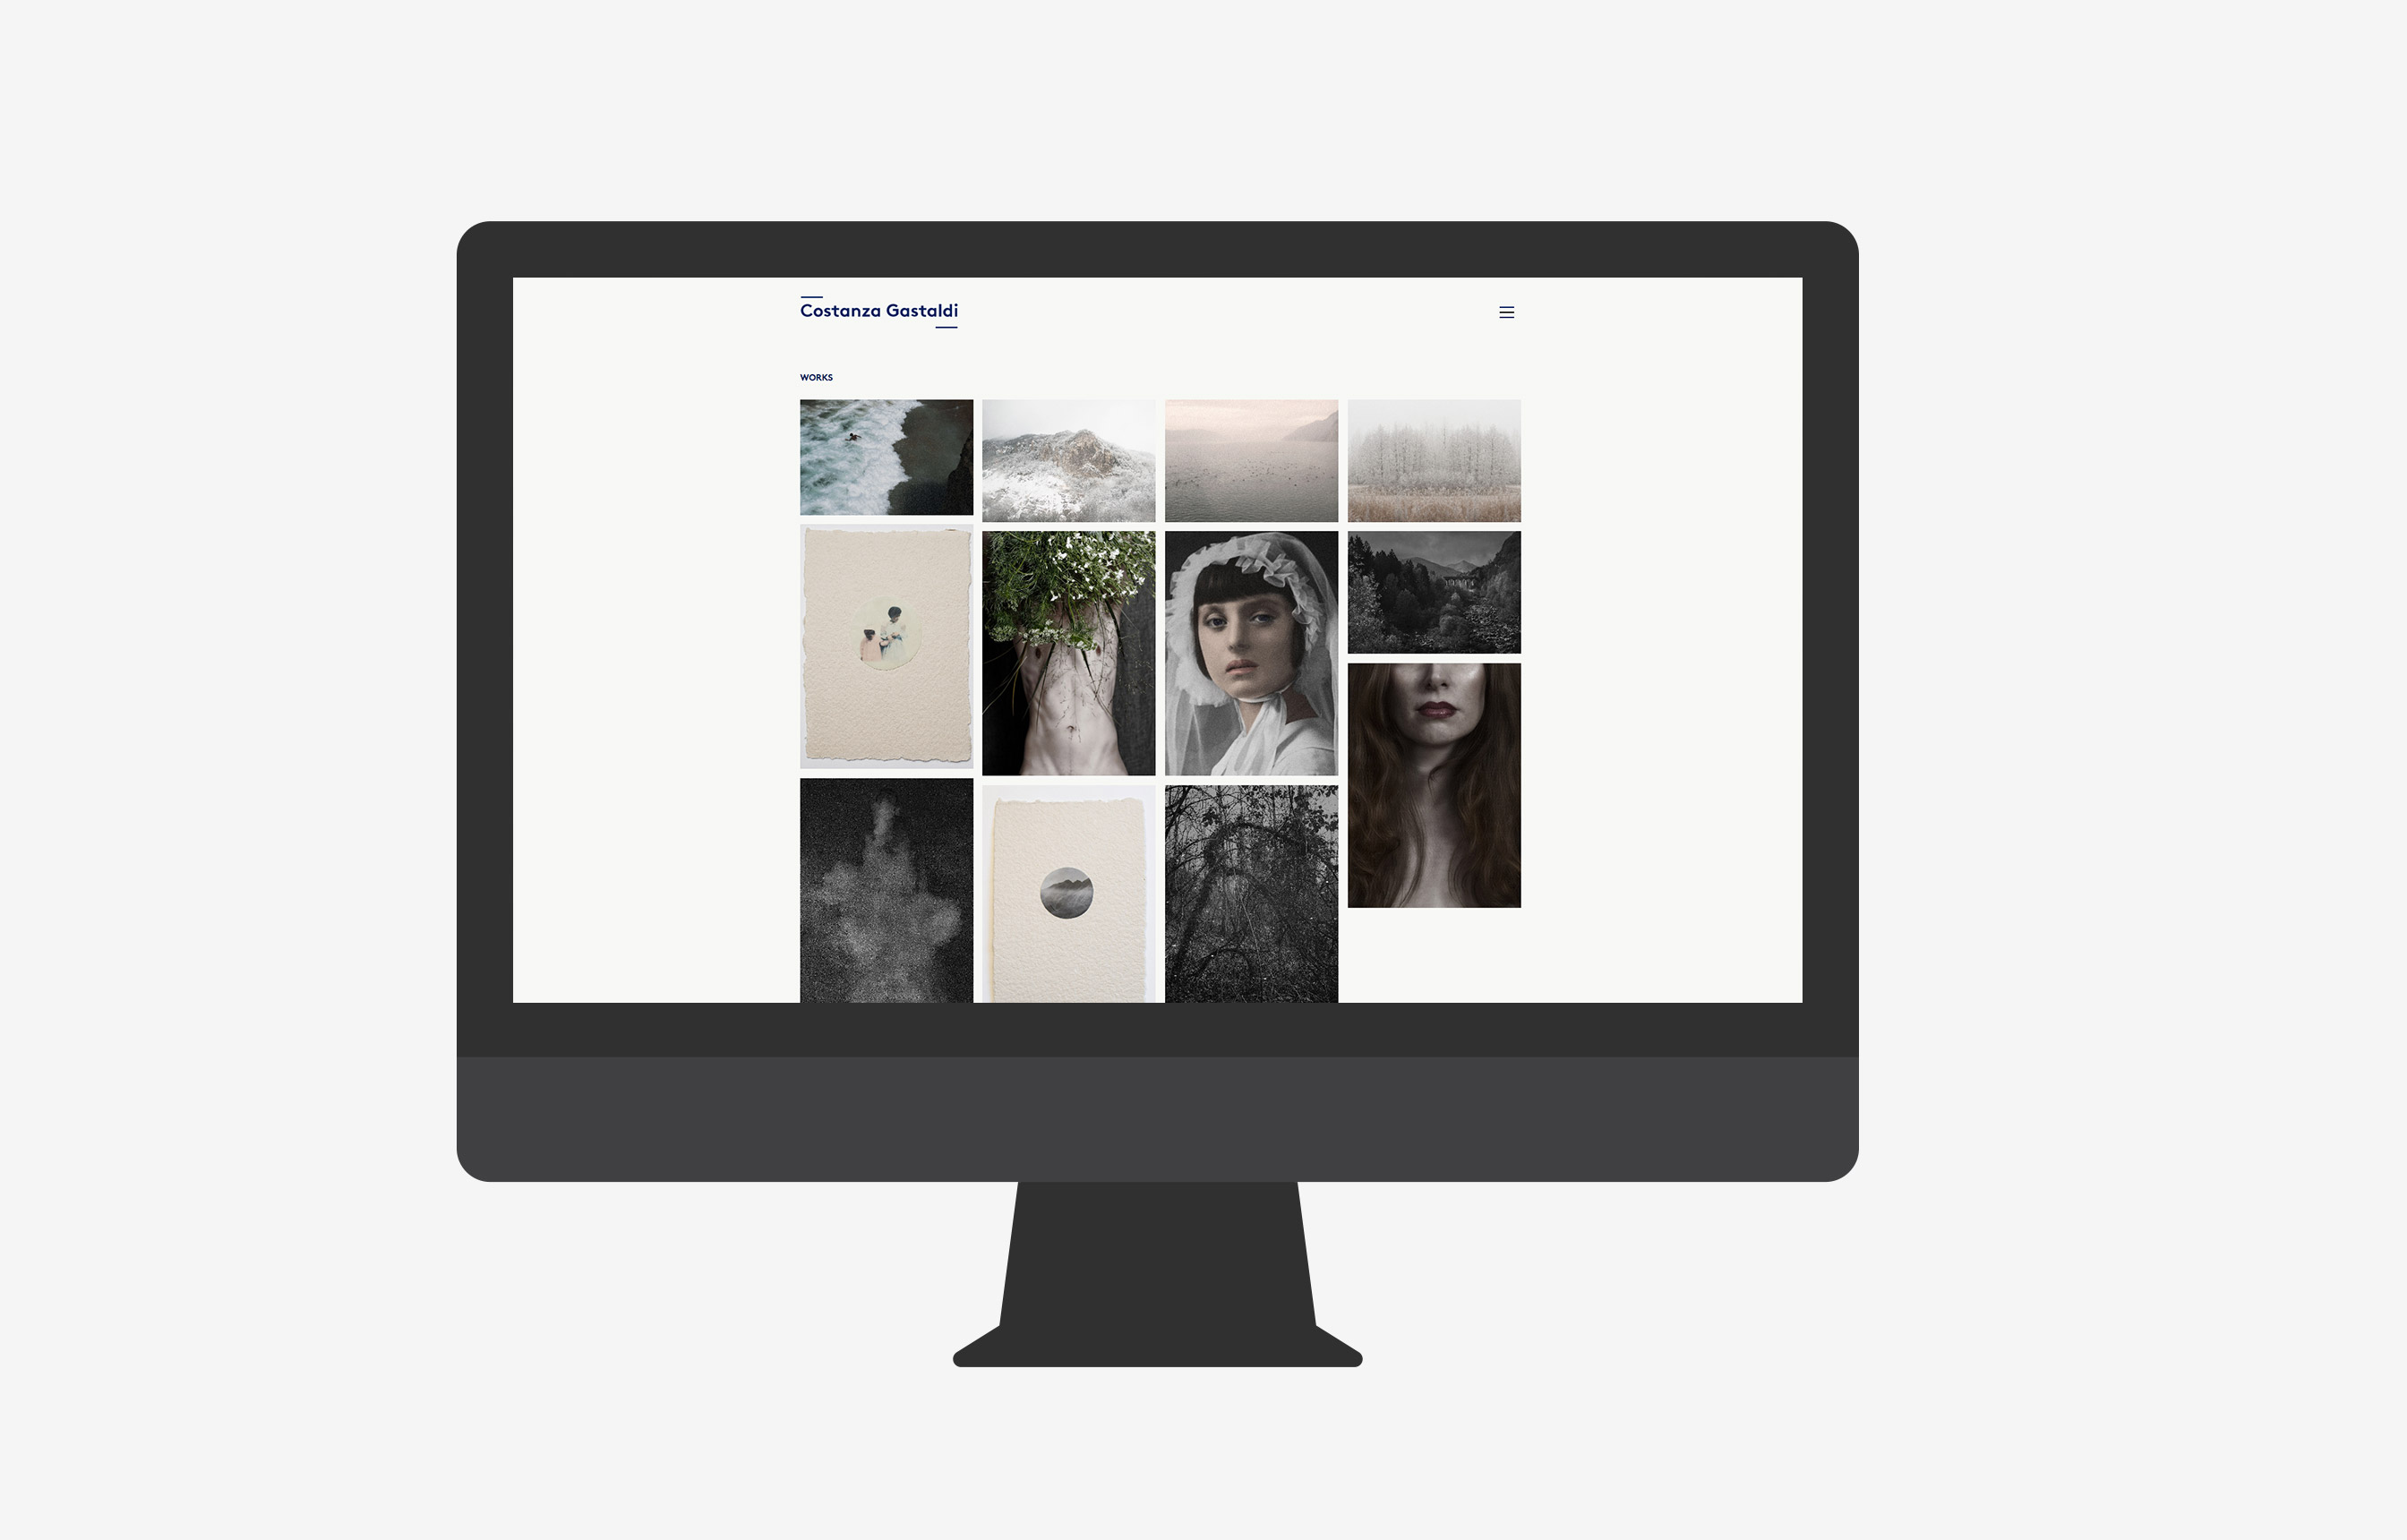 04-costanza-gastaldi-pikteo-webdesign-graphic-design-freelance-paris-bruxelles-londres